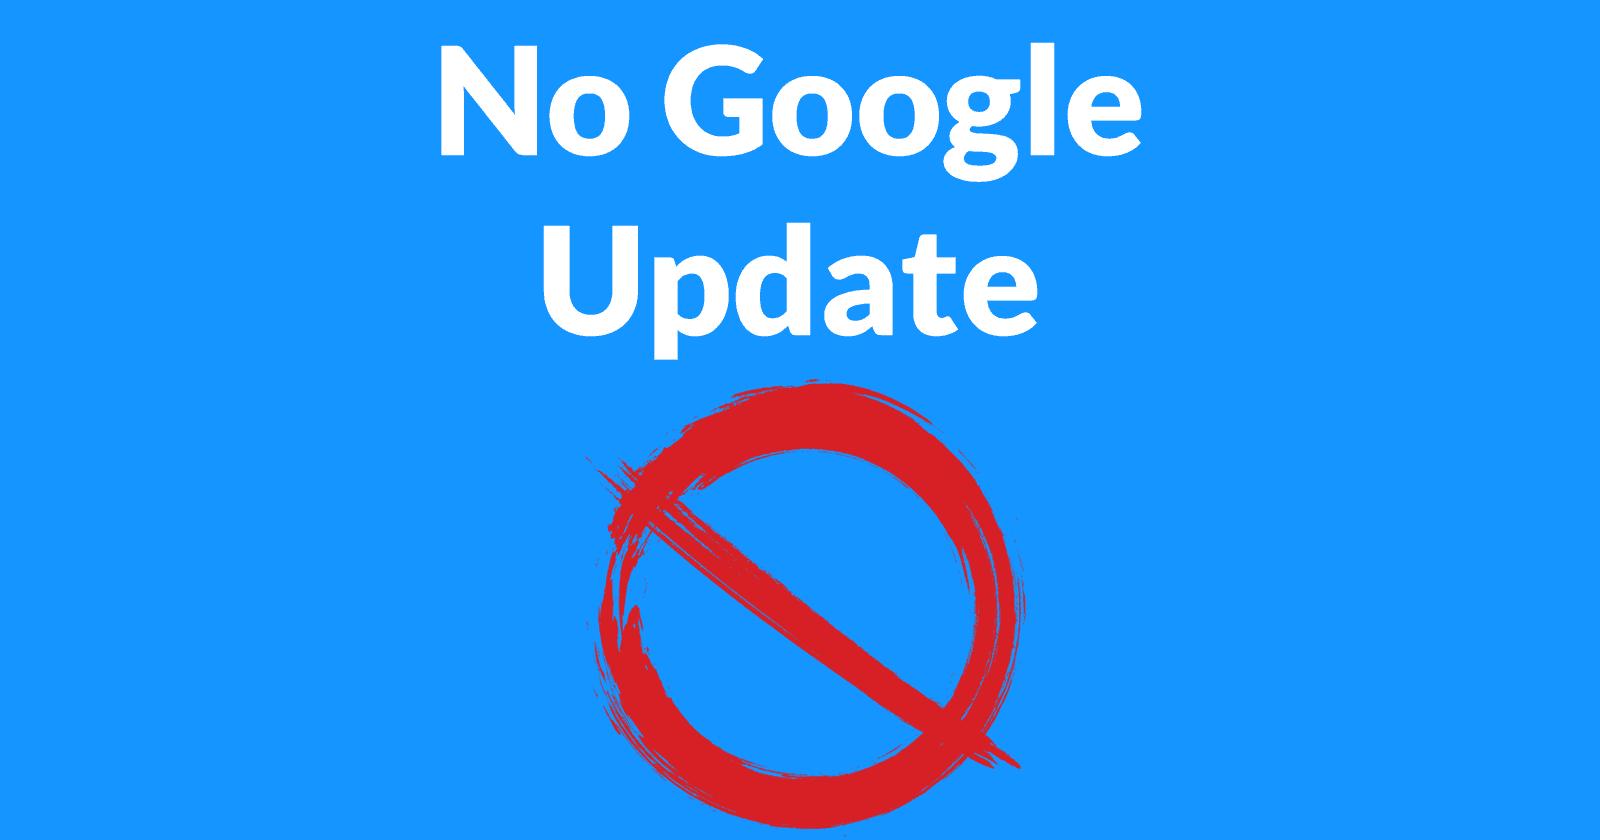 No google update